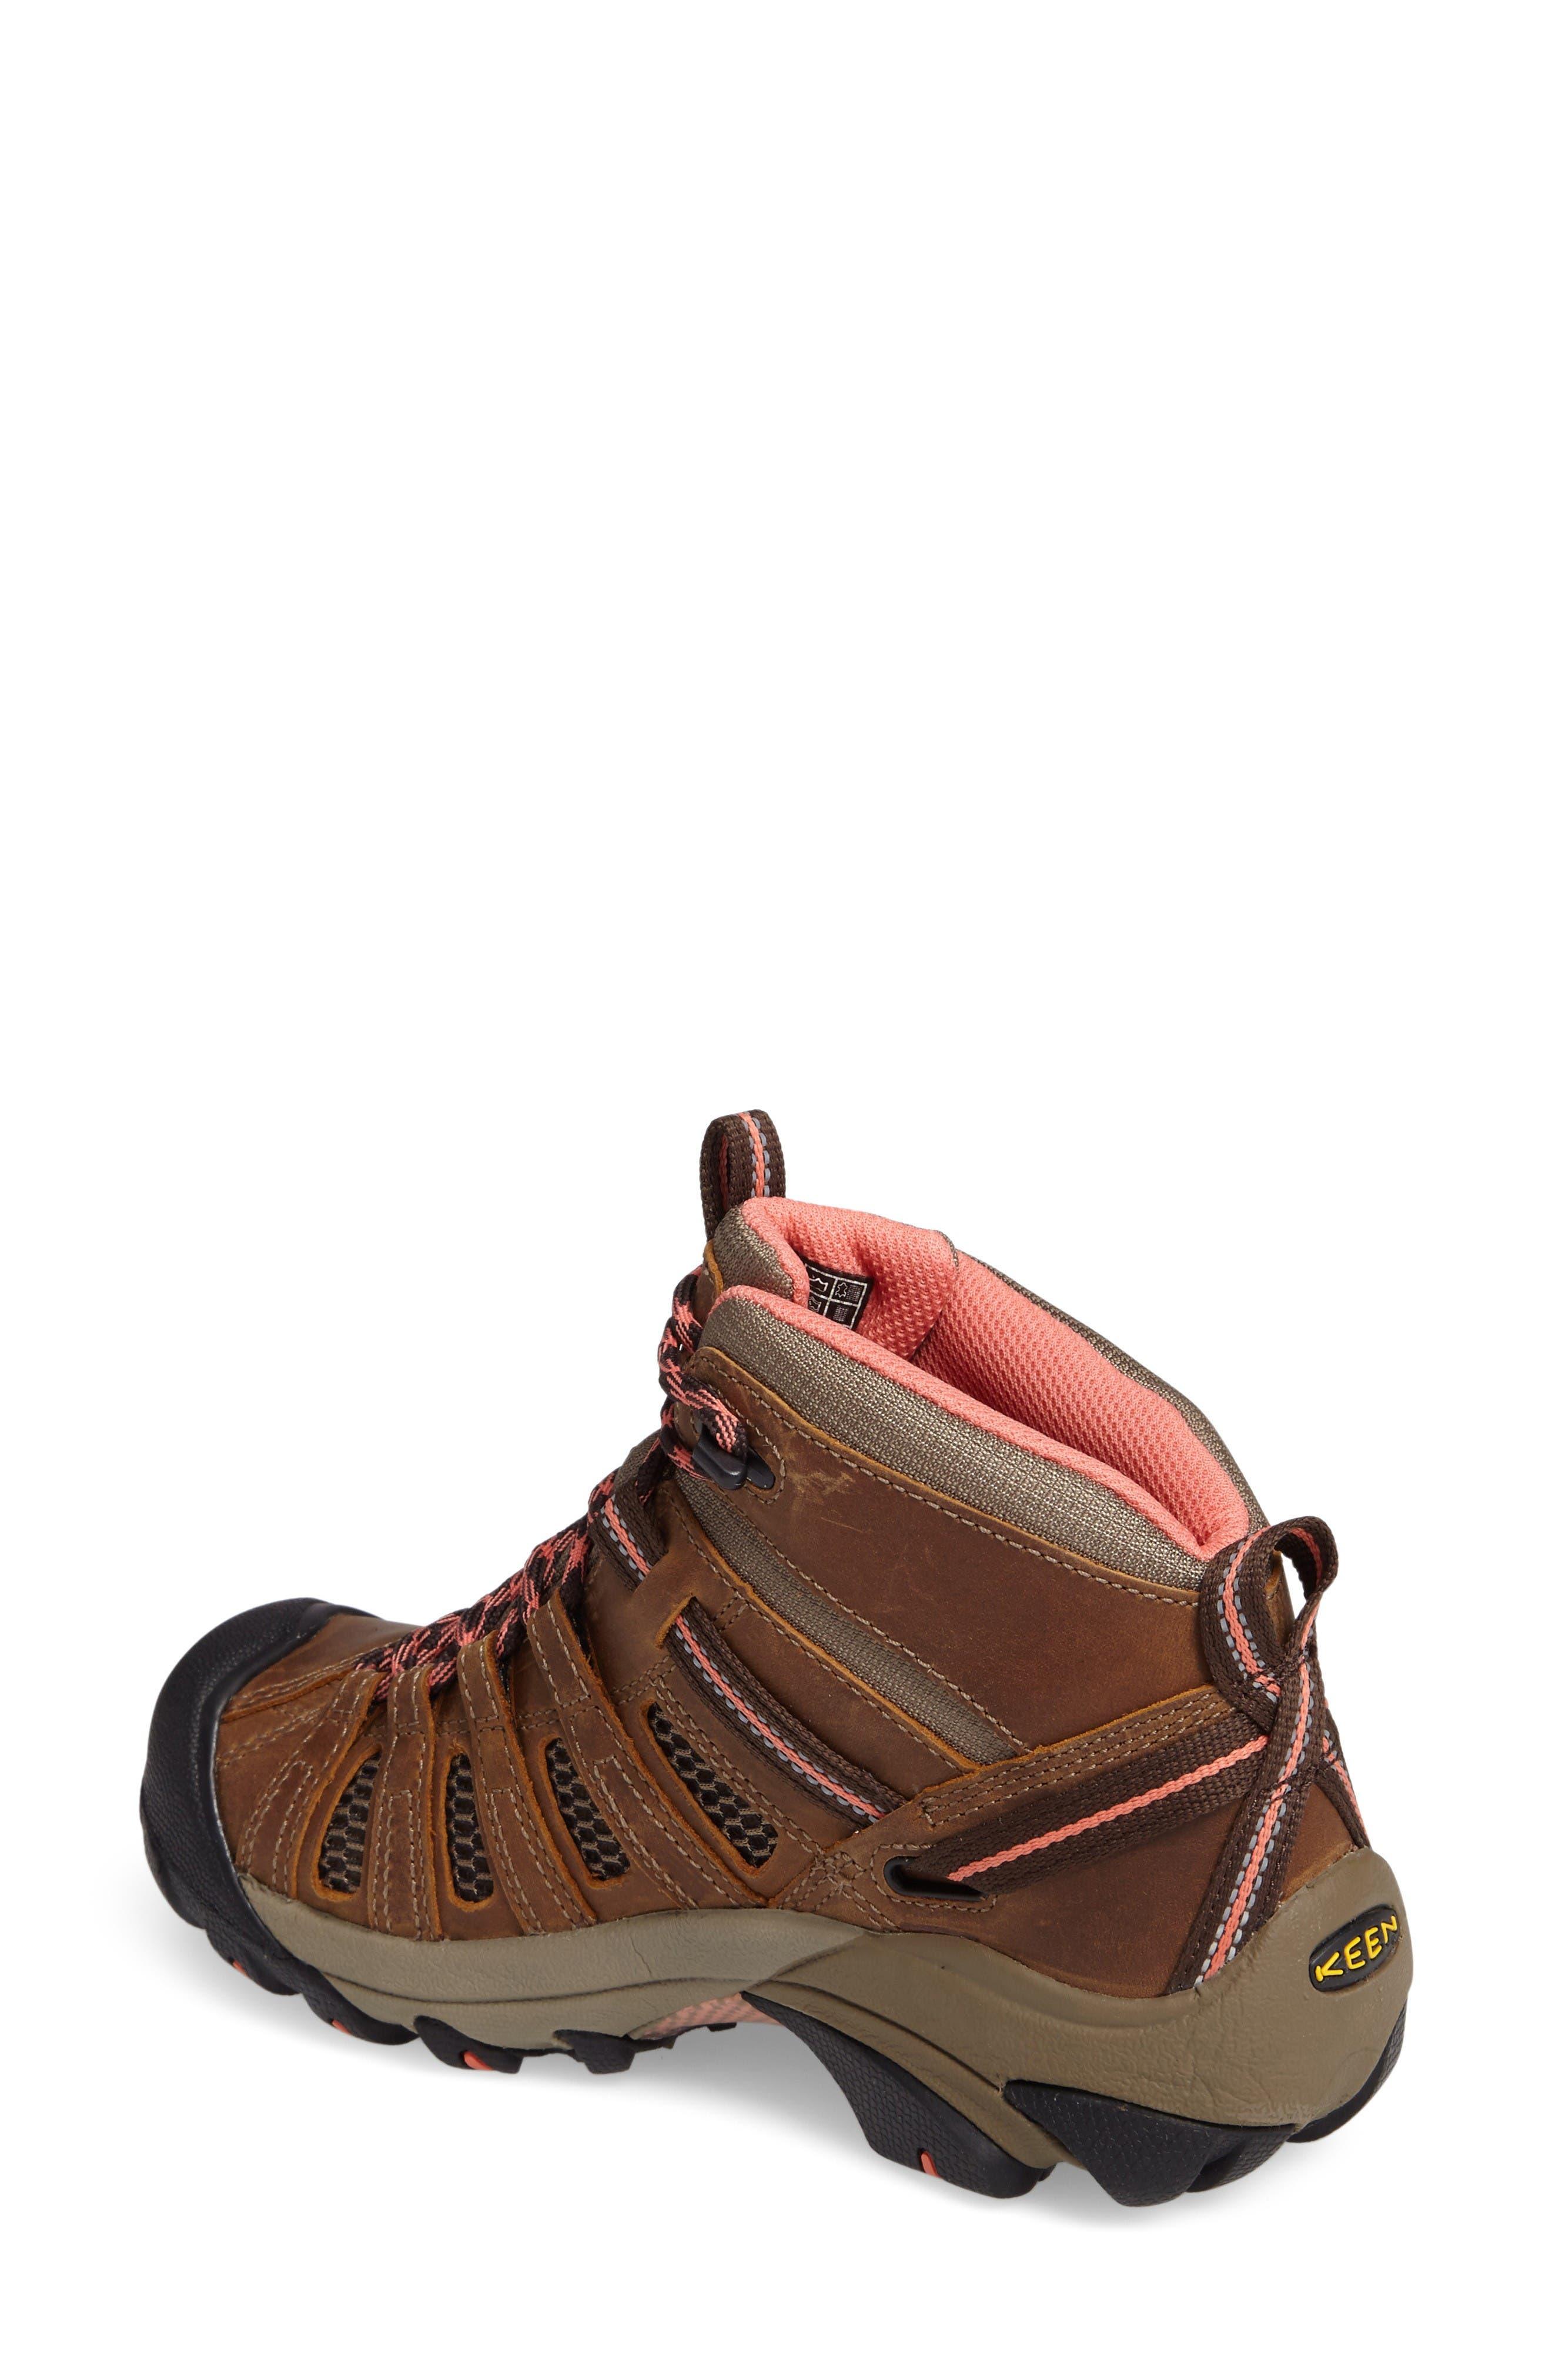 Alternate Image 2  - Keen 'Voyageur Mid' Trail Shoe (Women)